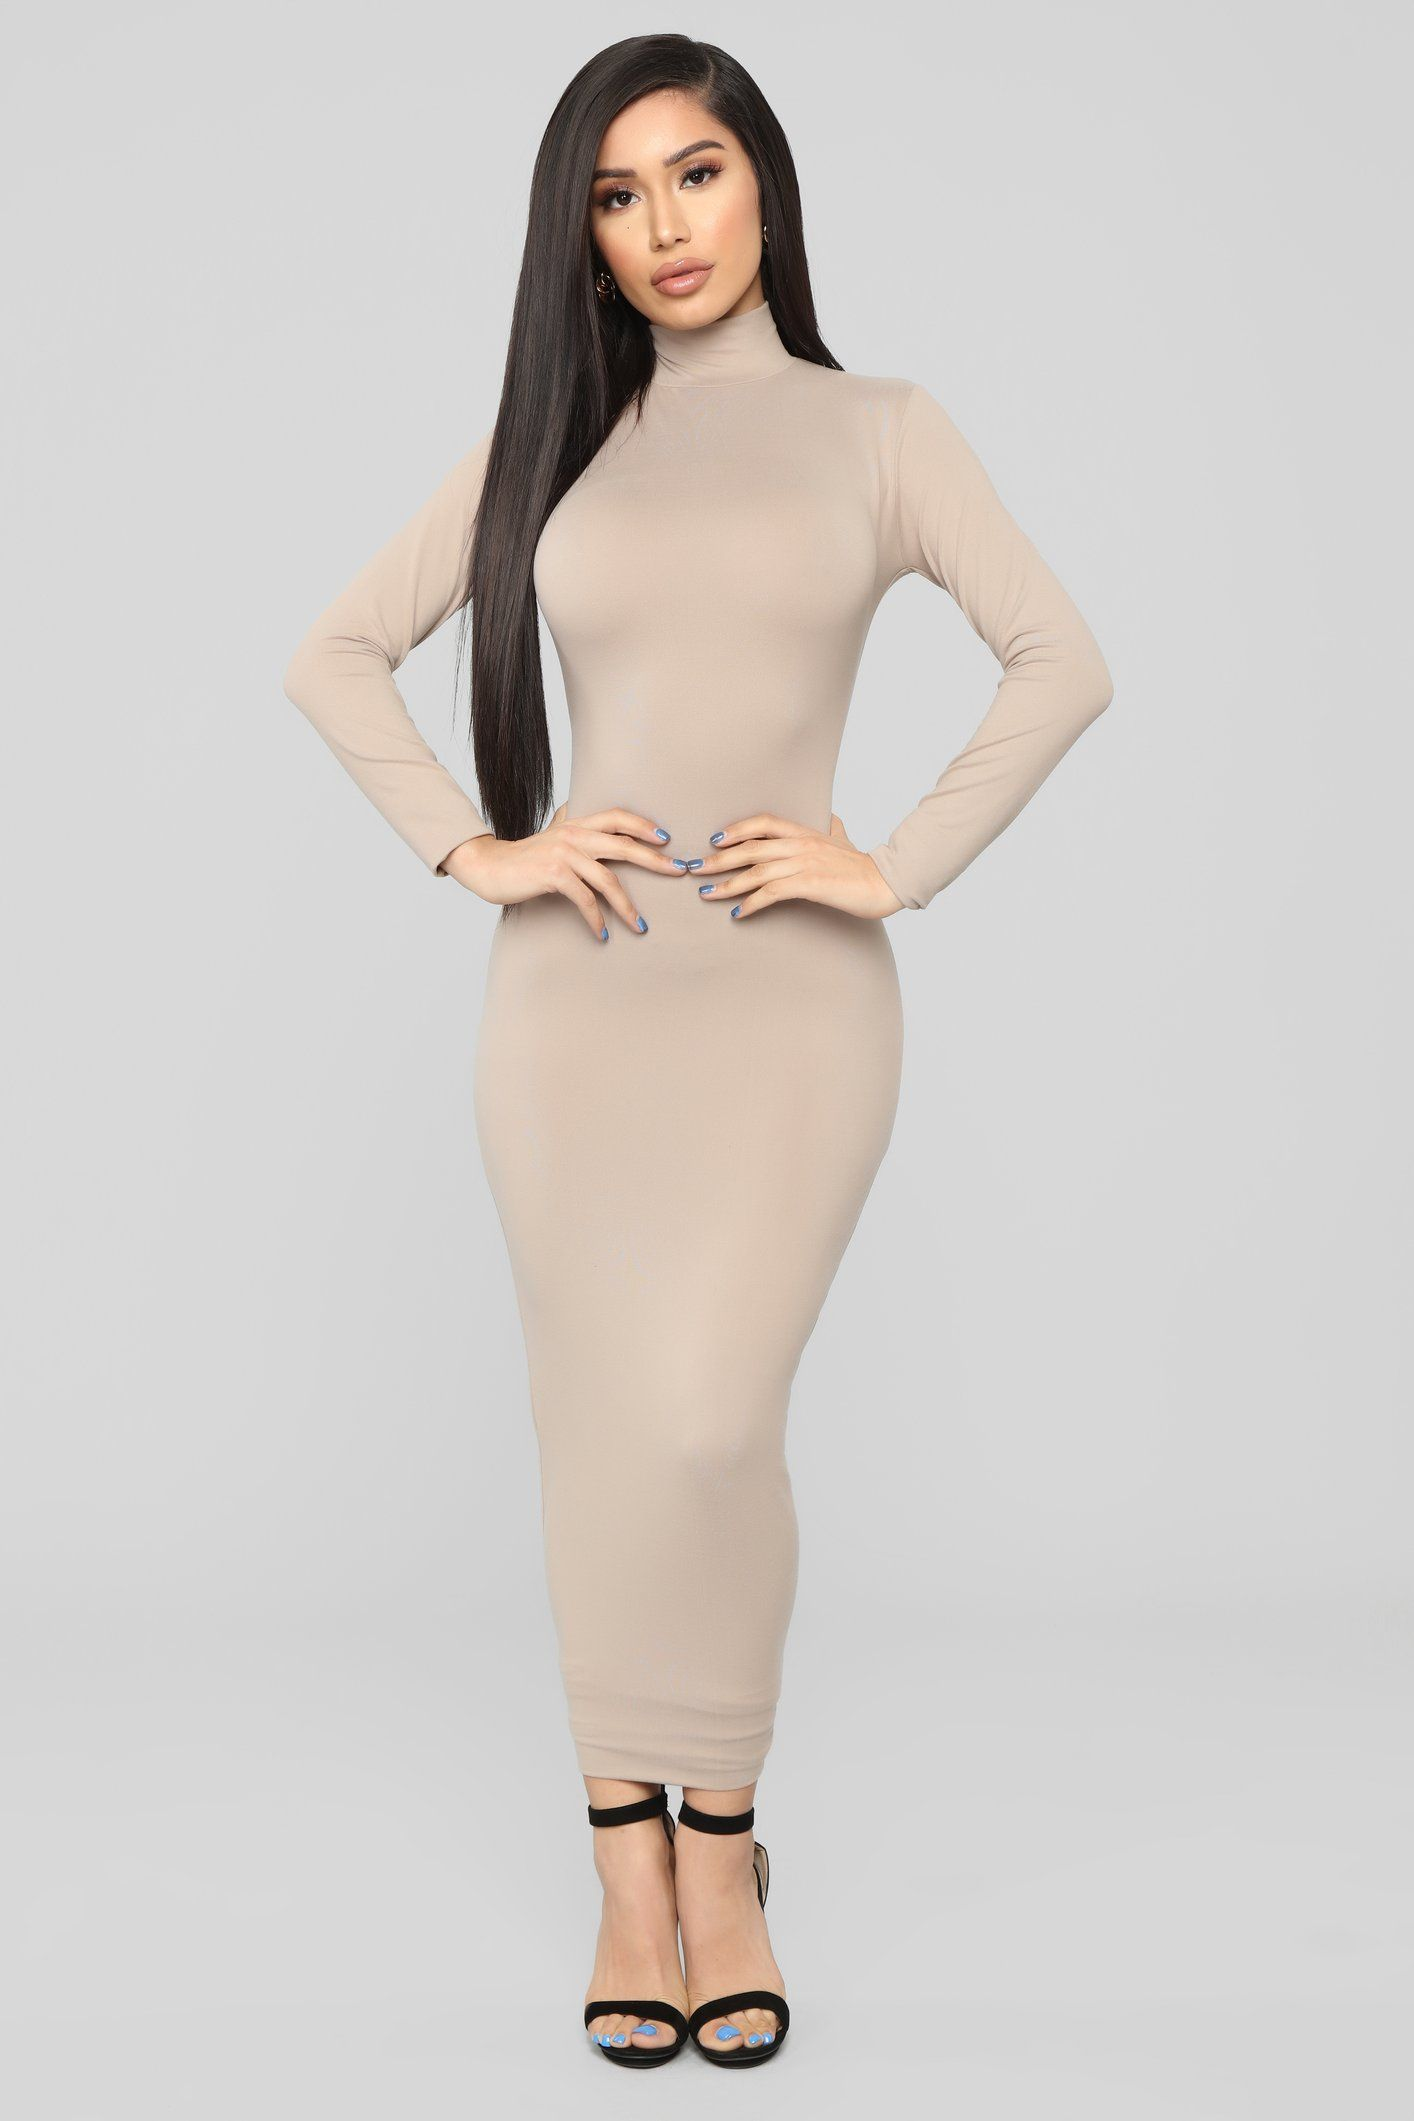 Imgur The Magic Of The Internet Silk Dress Fashion Fashion Dress Up Games Maxi Dress [ 2121 x 1414 Pixel ]